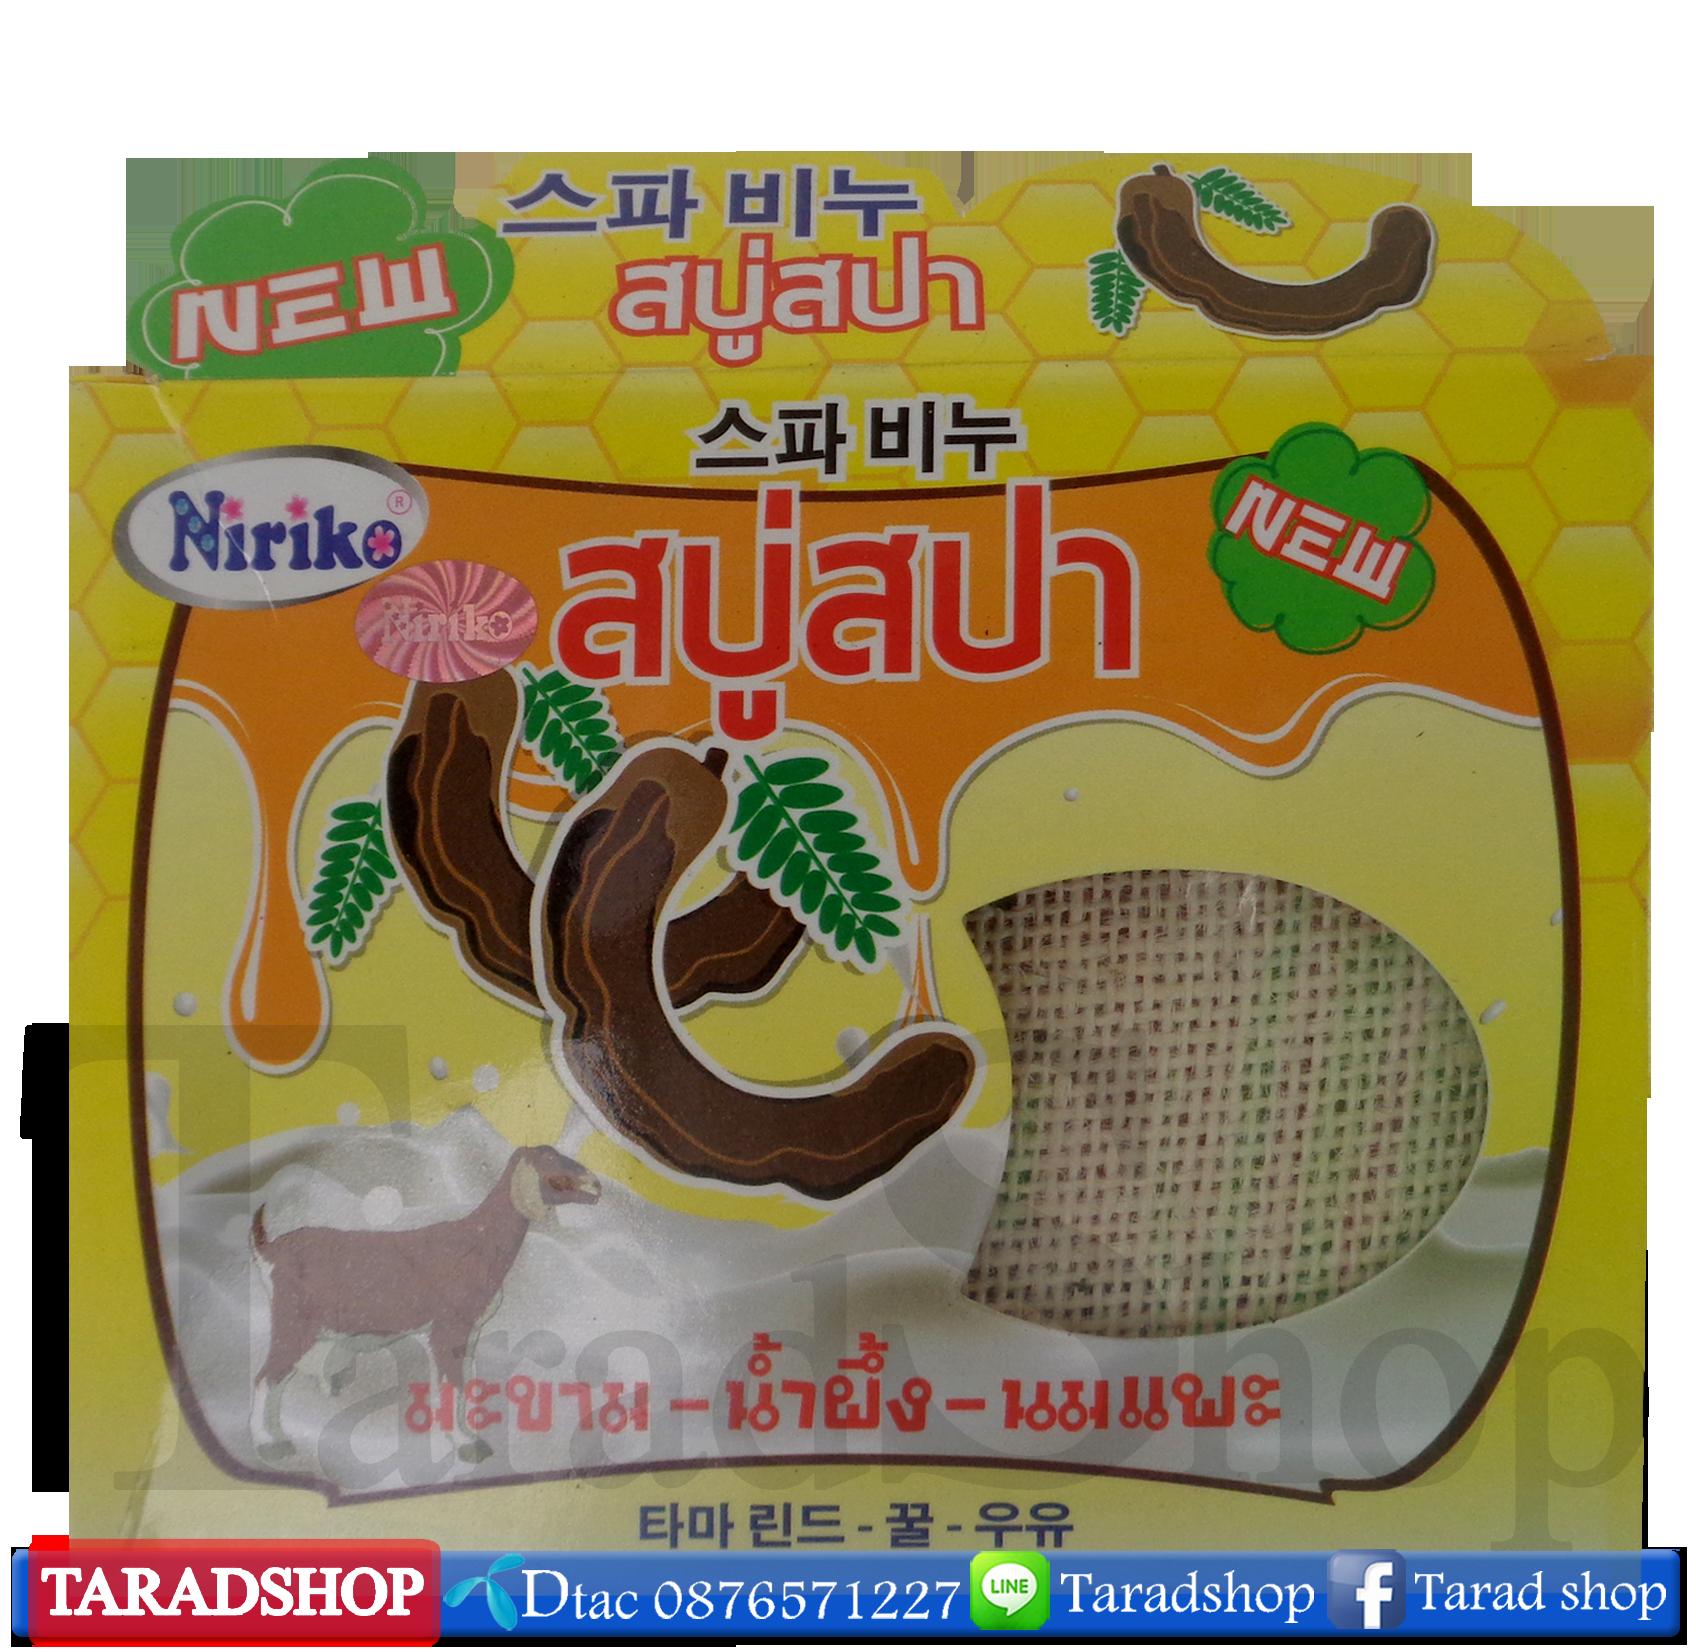 Niriko สบู่สปามะขาม น้ำผึ้งนมแพะ (ชนิดกล่อง)